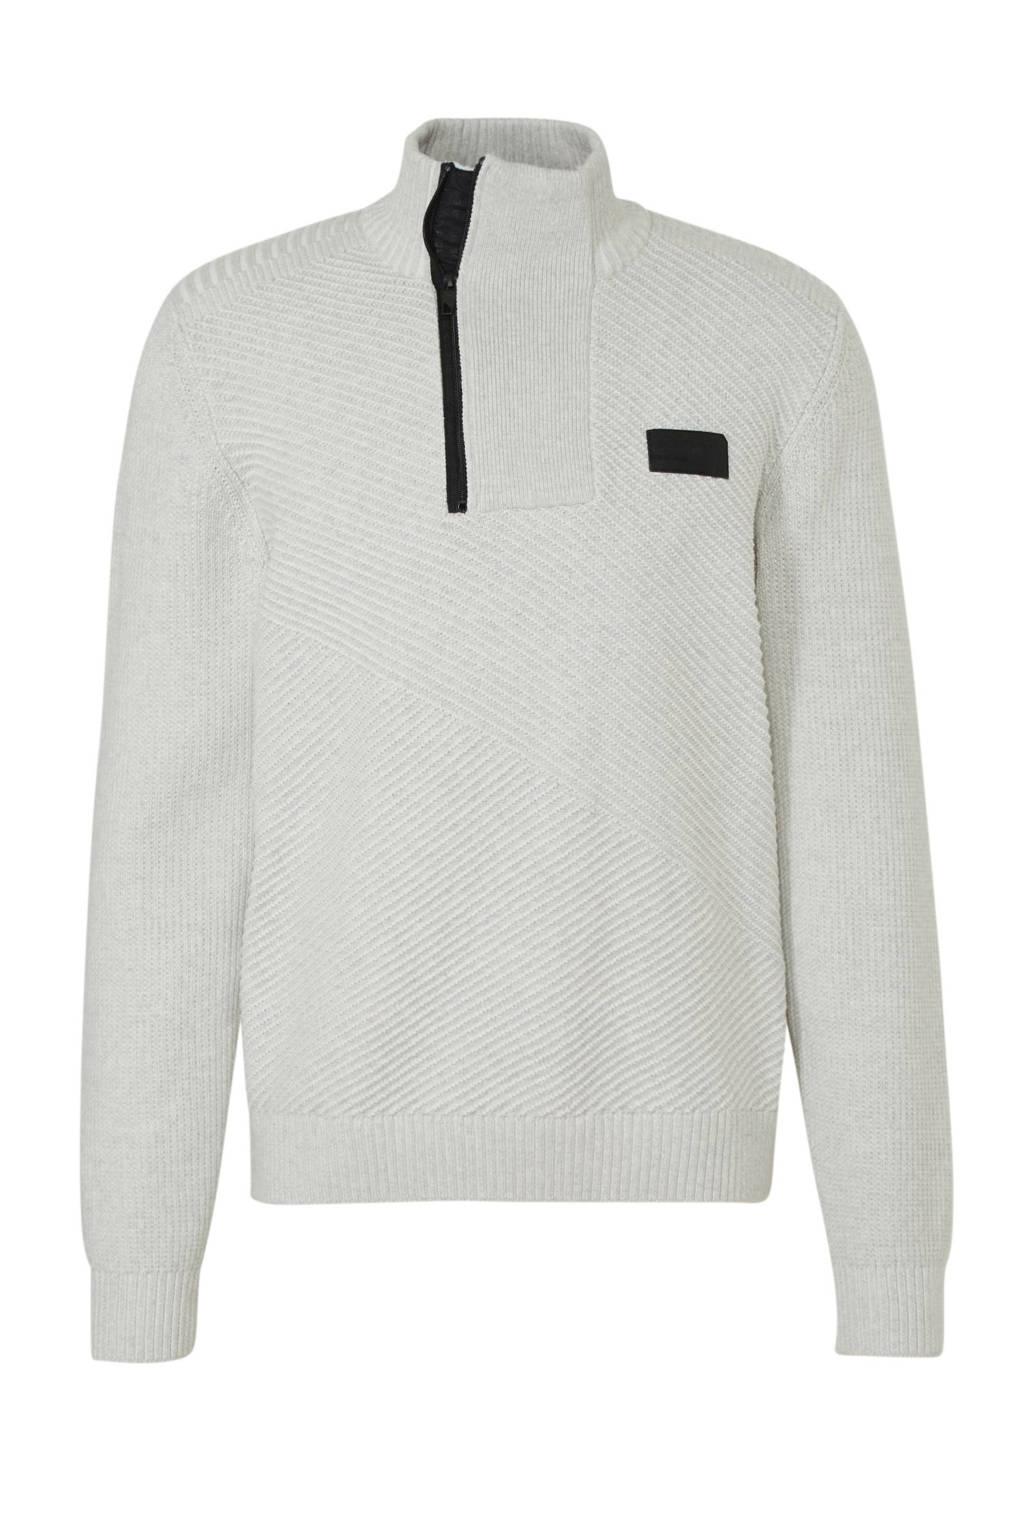 C&A Angelo Litrico sweater met printopdruk ecru, Ecru